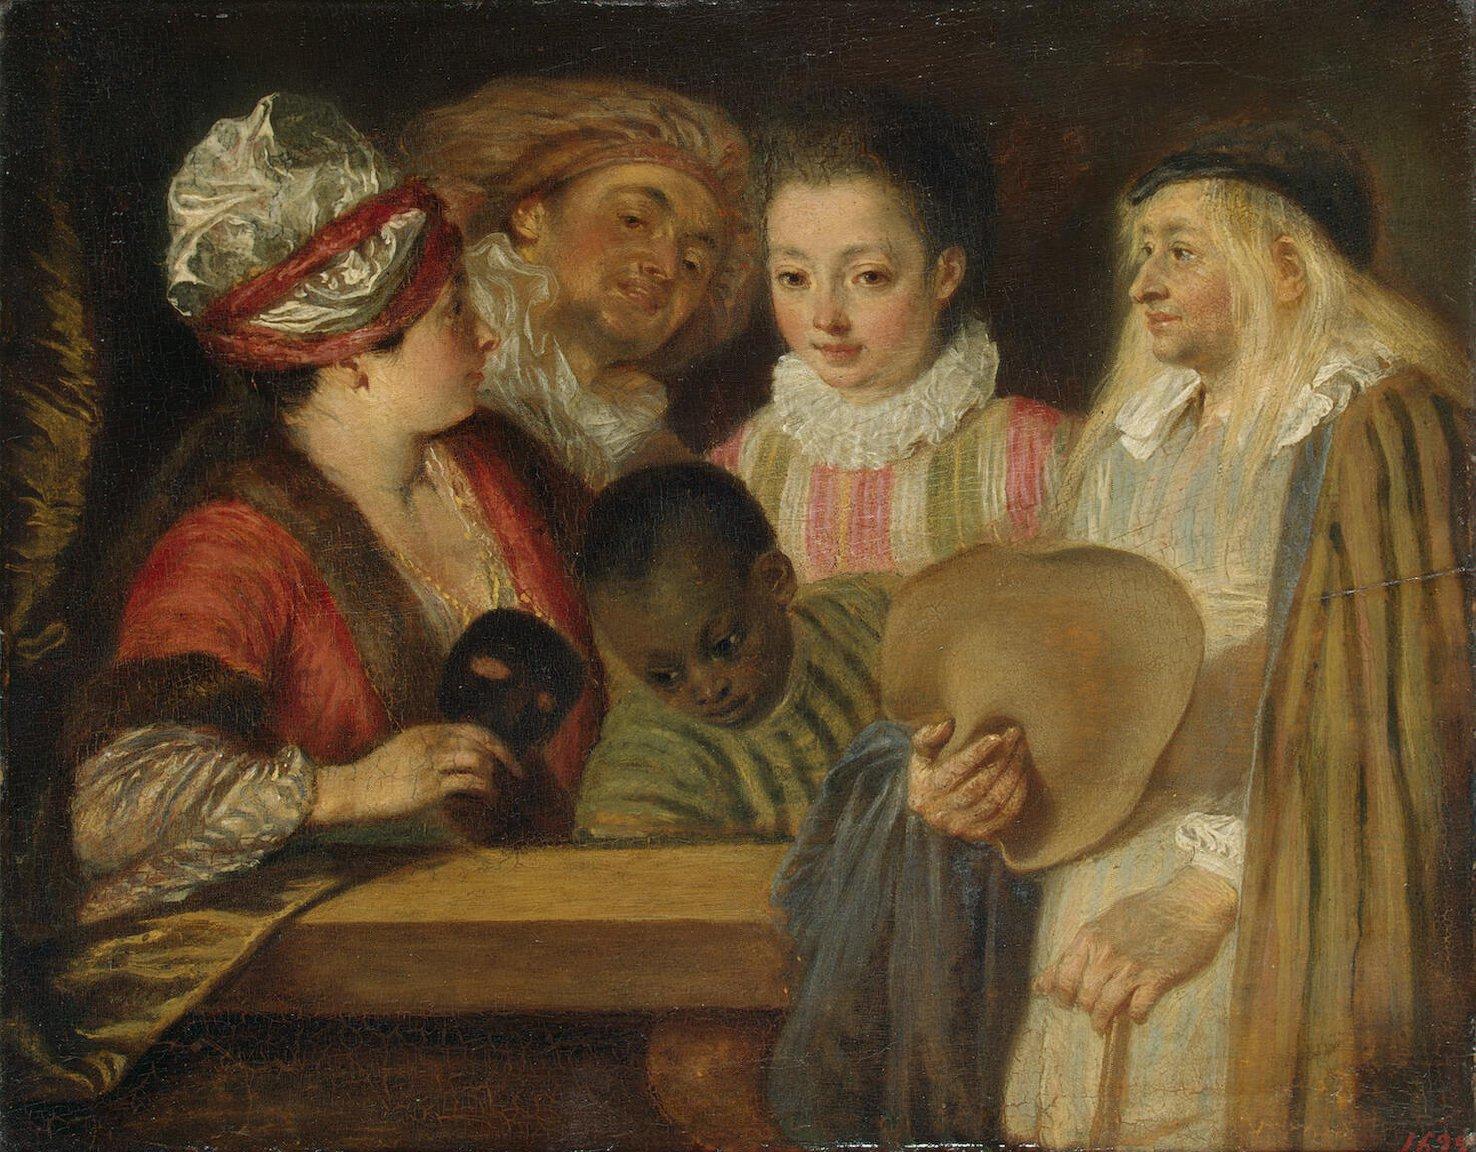 Actors of the Comedie-Francaise by Jean-Antoine Watteau (1711-1718)